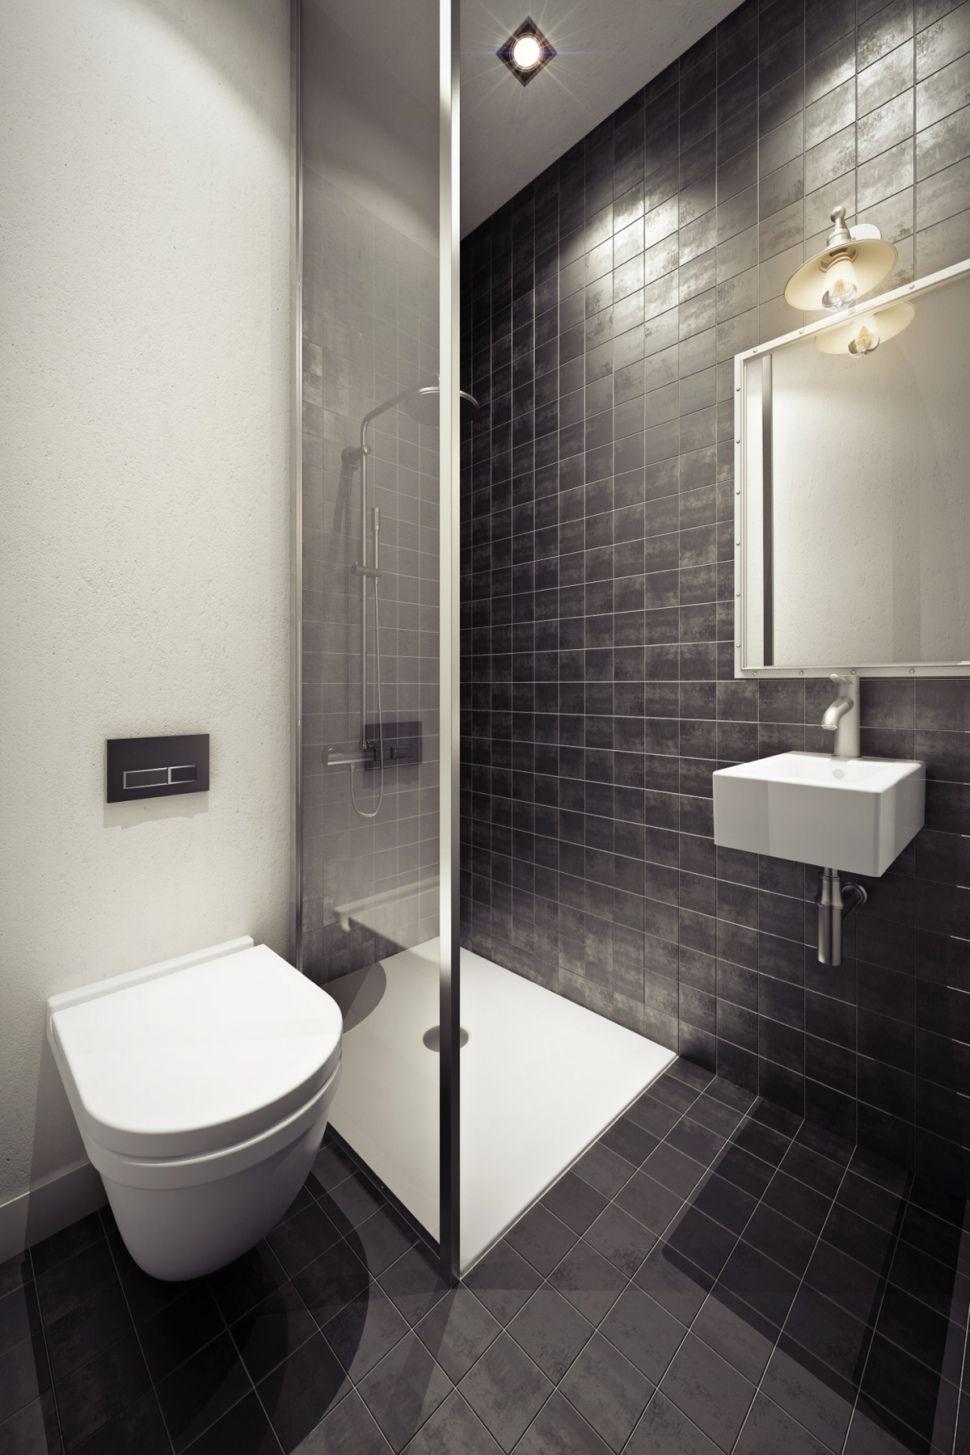 DecorationAdorable Small Bathroom Design Ideas With Toilet And - Bathroom design small area